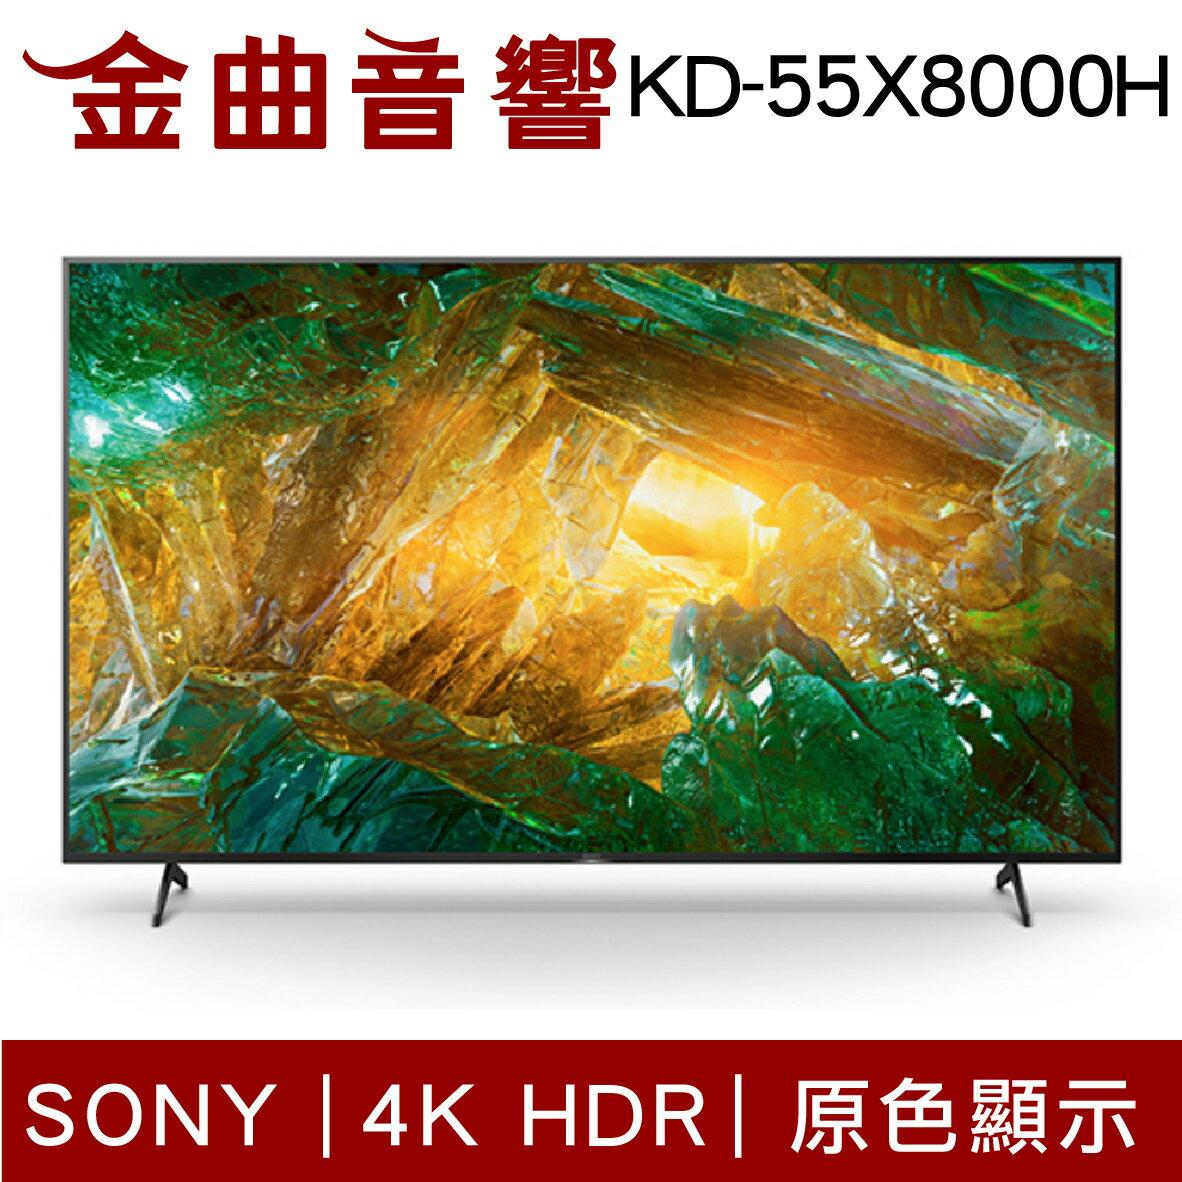 SONY 索尼 KD-55X8000H 4K LED 55吋 液晶 電視 2020 | 金曲音響